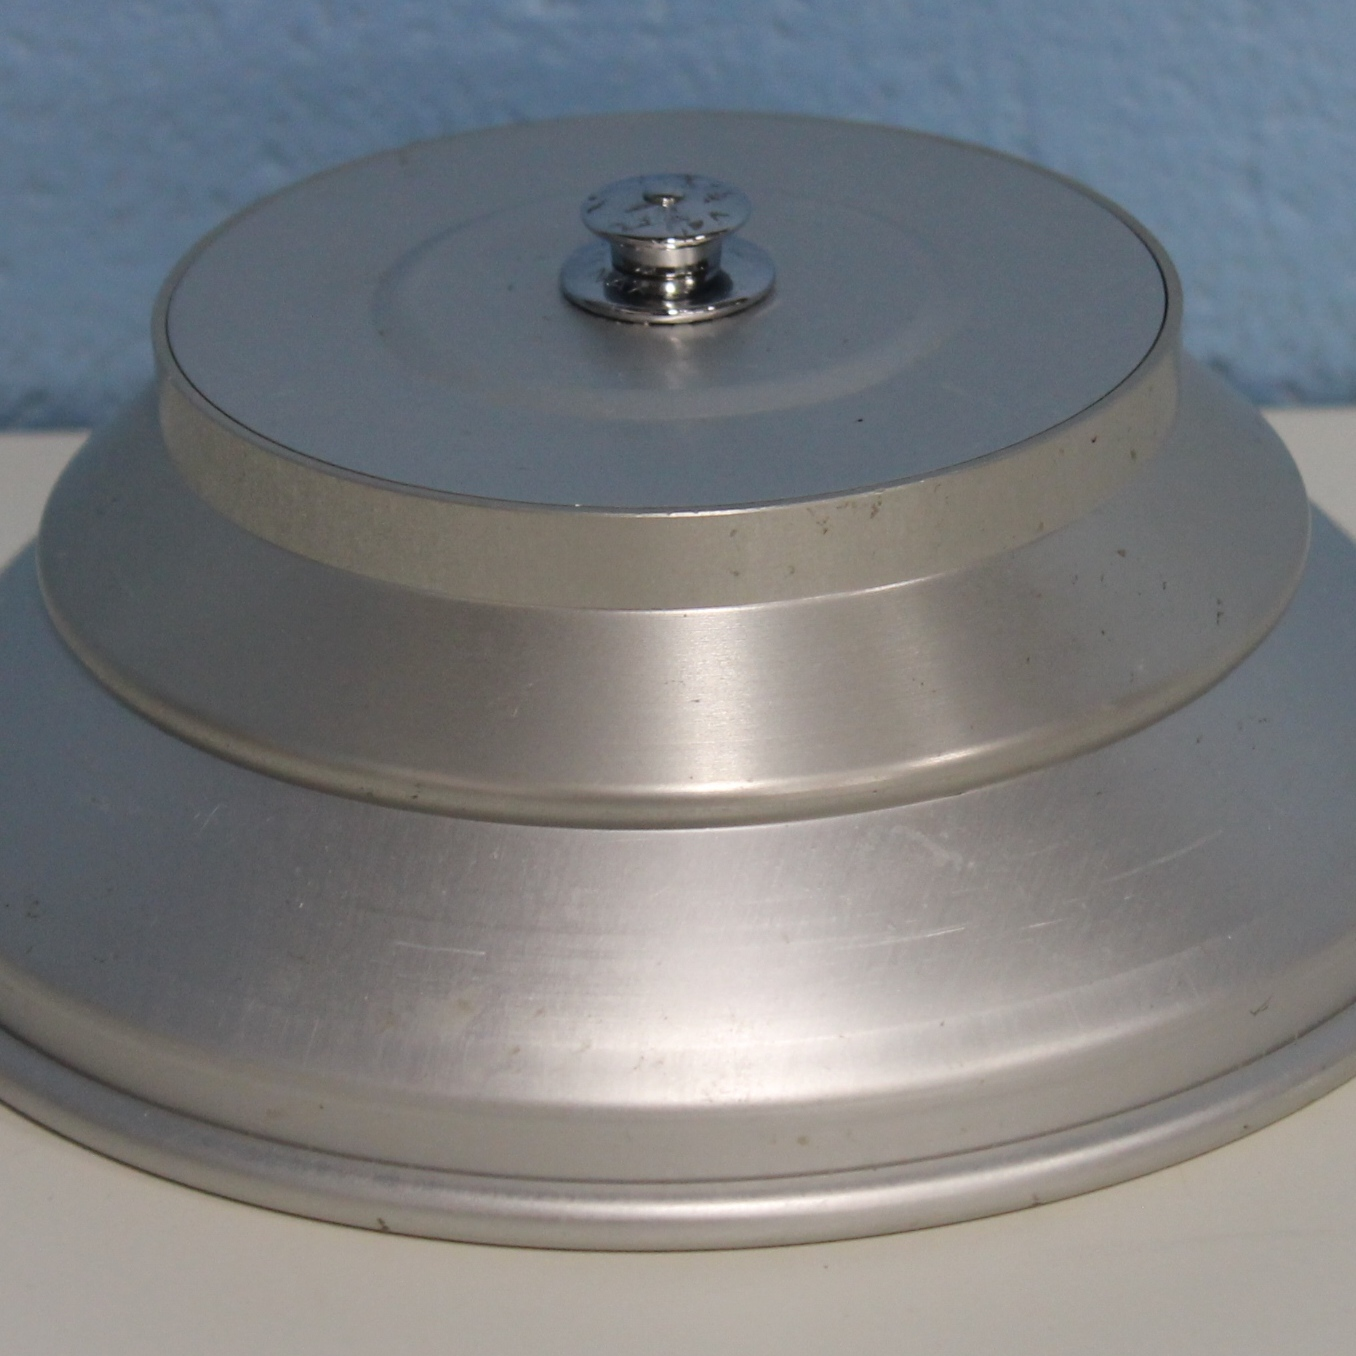 Hermle Model 220.56V 12 Position Rotor Image